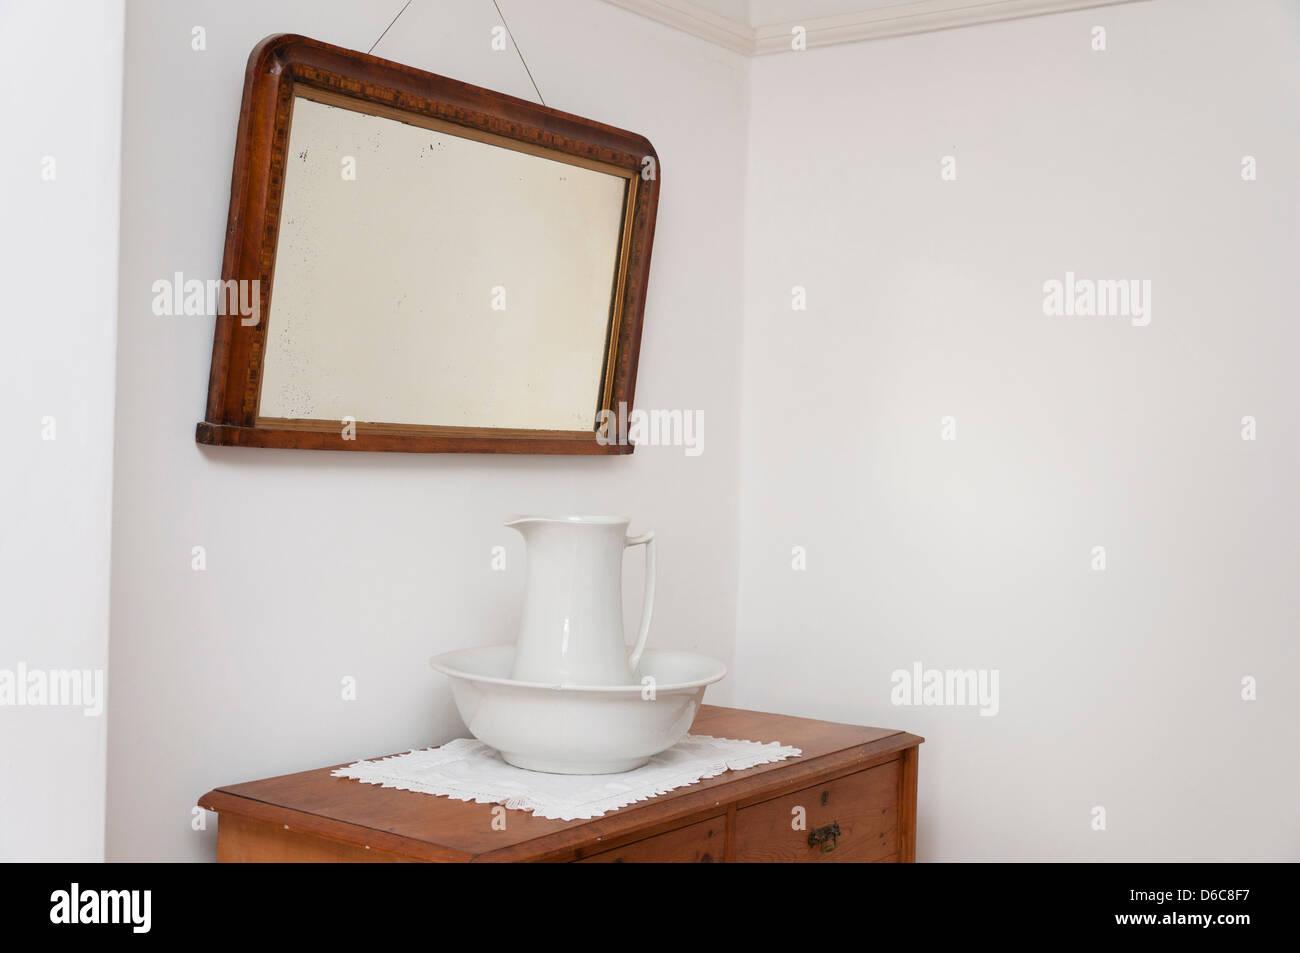 Wash Bowl Stock Photos & Wash Bowl Stock Images - Alamy